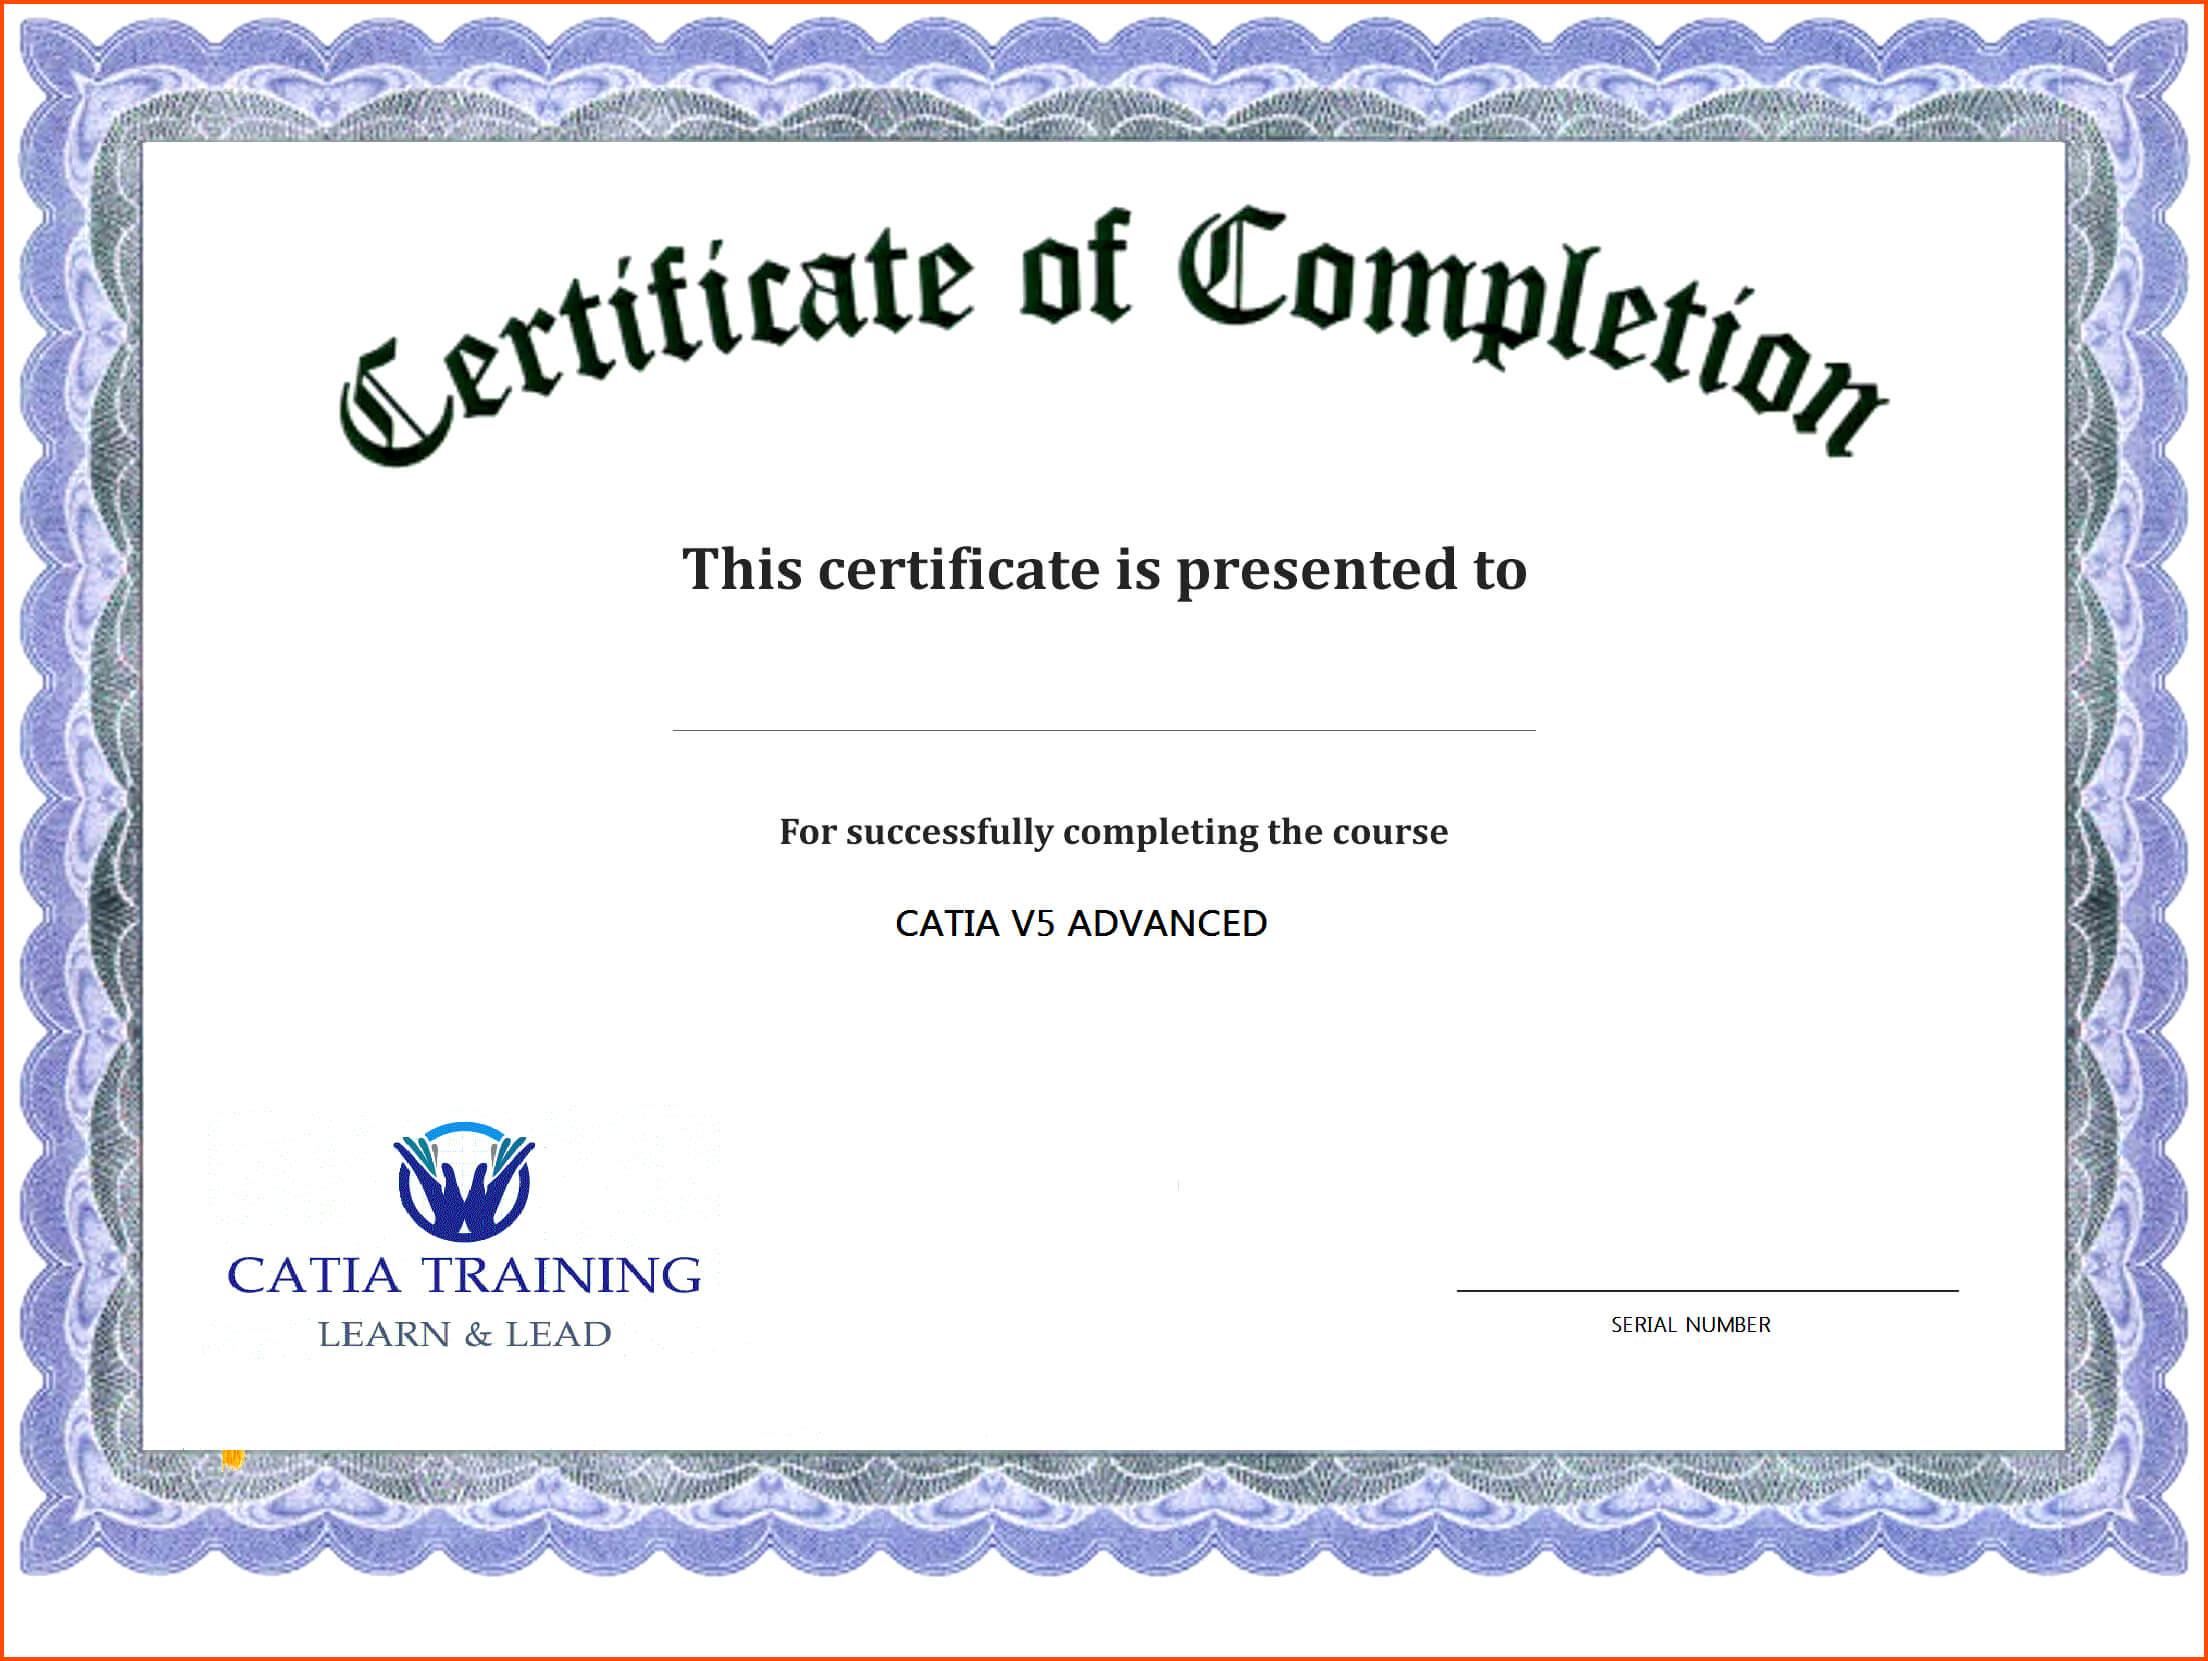 038 Award Certificate Template Word Free Printable Editable With Regard To Blank Award Certificate Templates Word